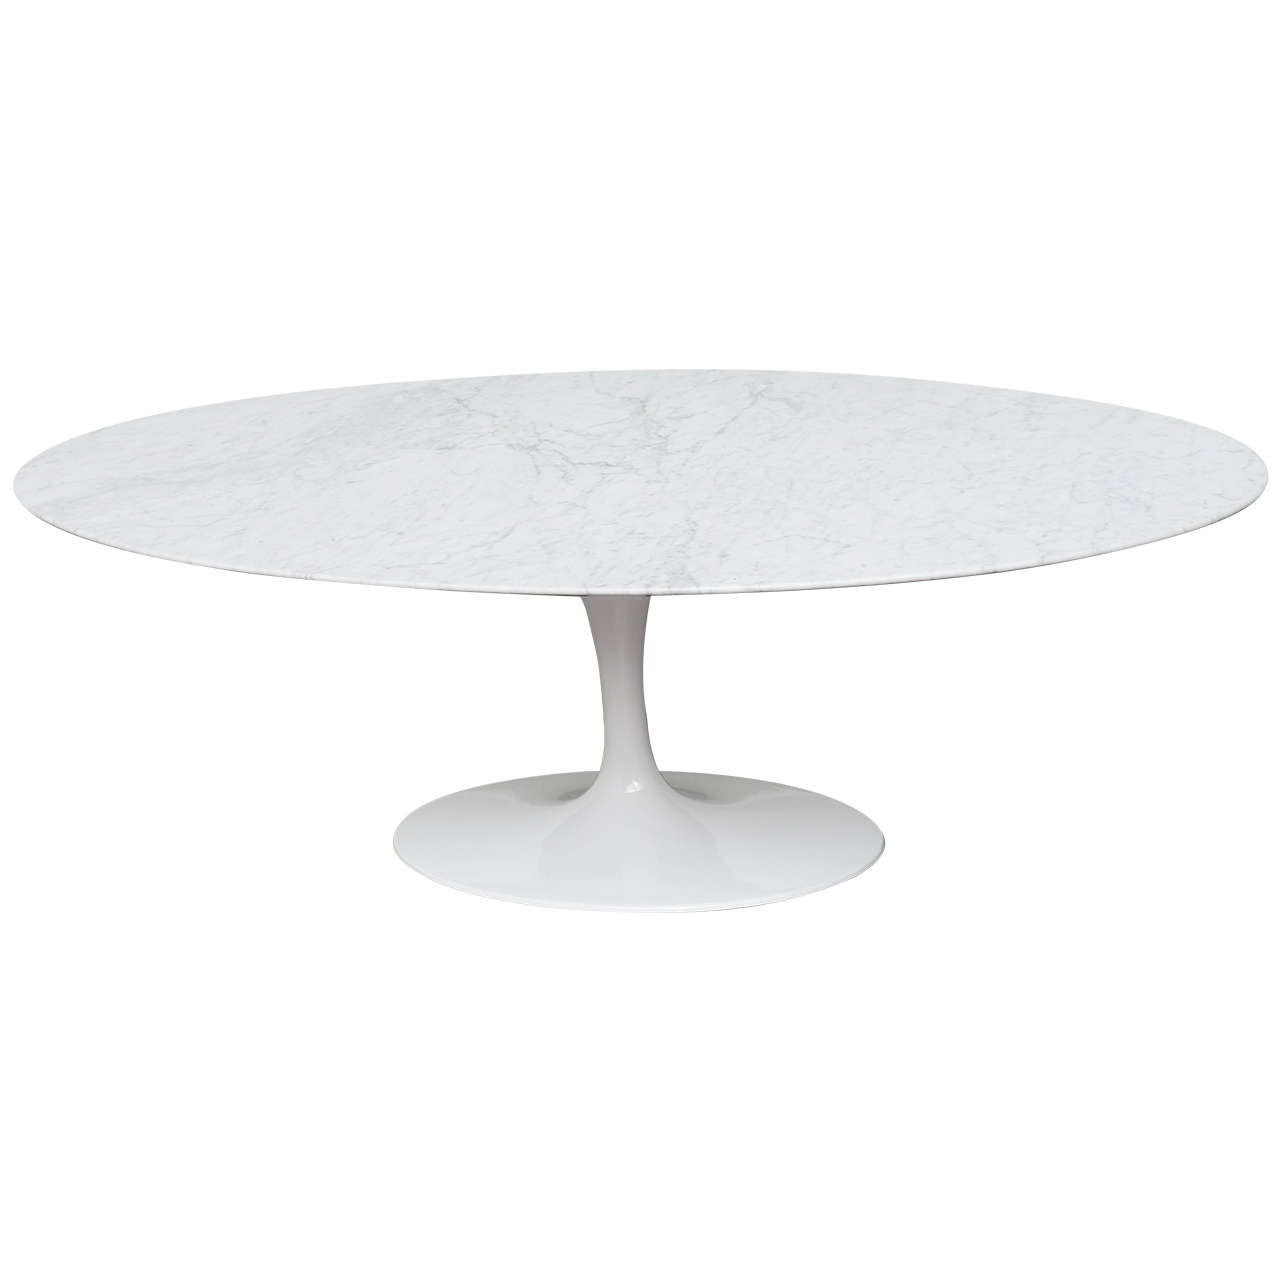 Sarrinen tulip coffee table on pedestal base for Tulip coffee table